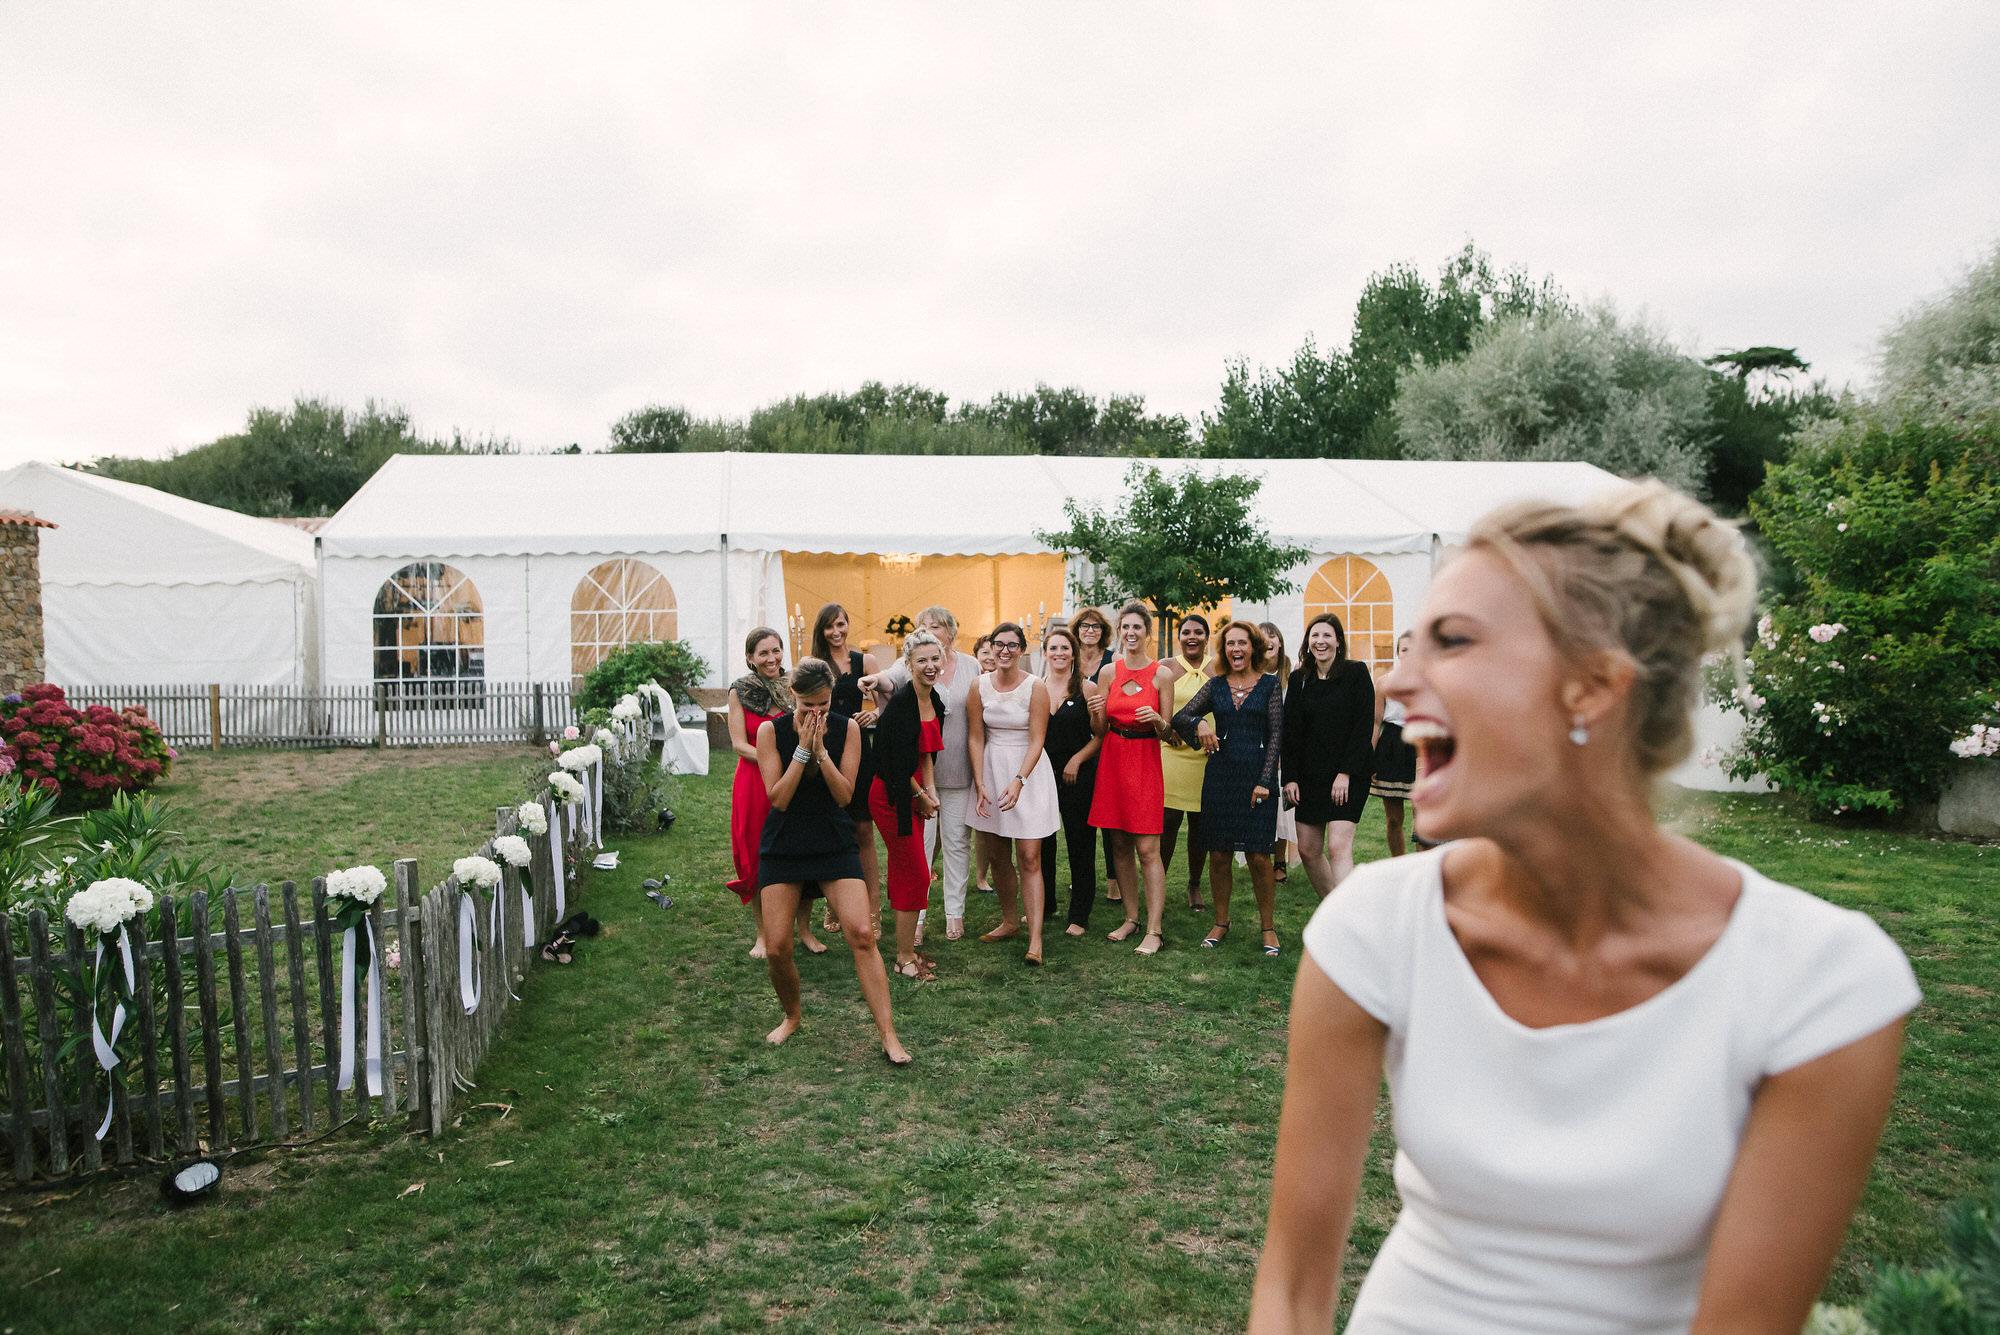 photographe-mariage-ile-d-yeu-00070